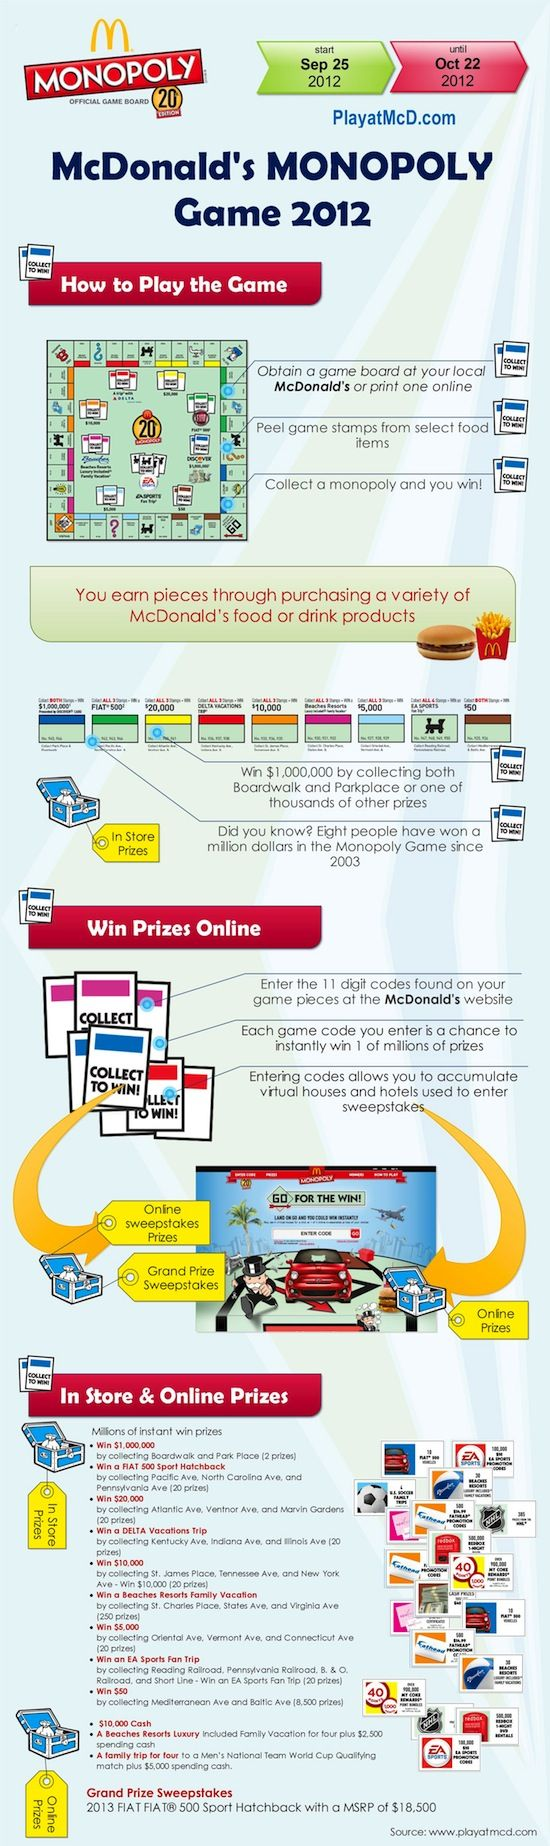 McDonald's Monopoly Game infographic